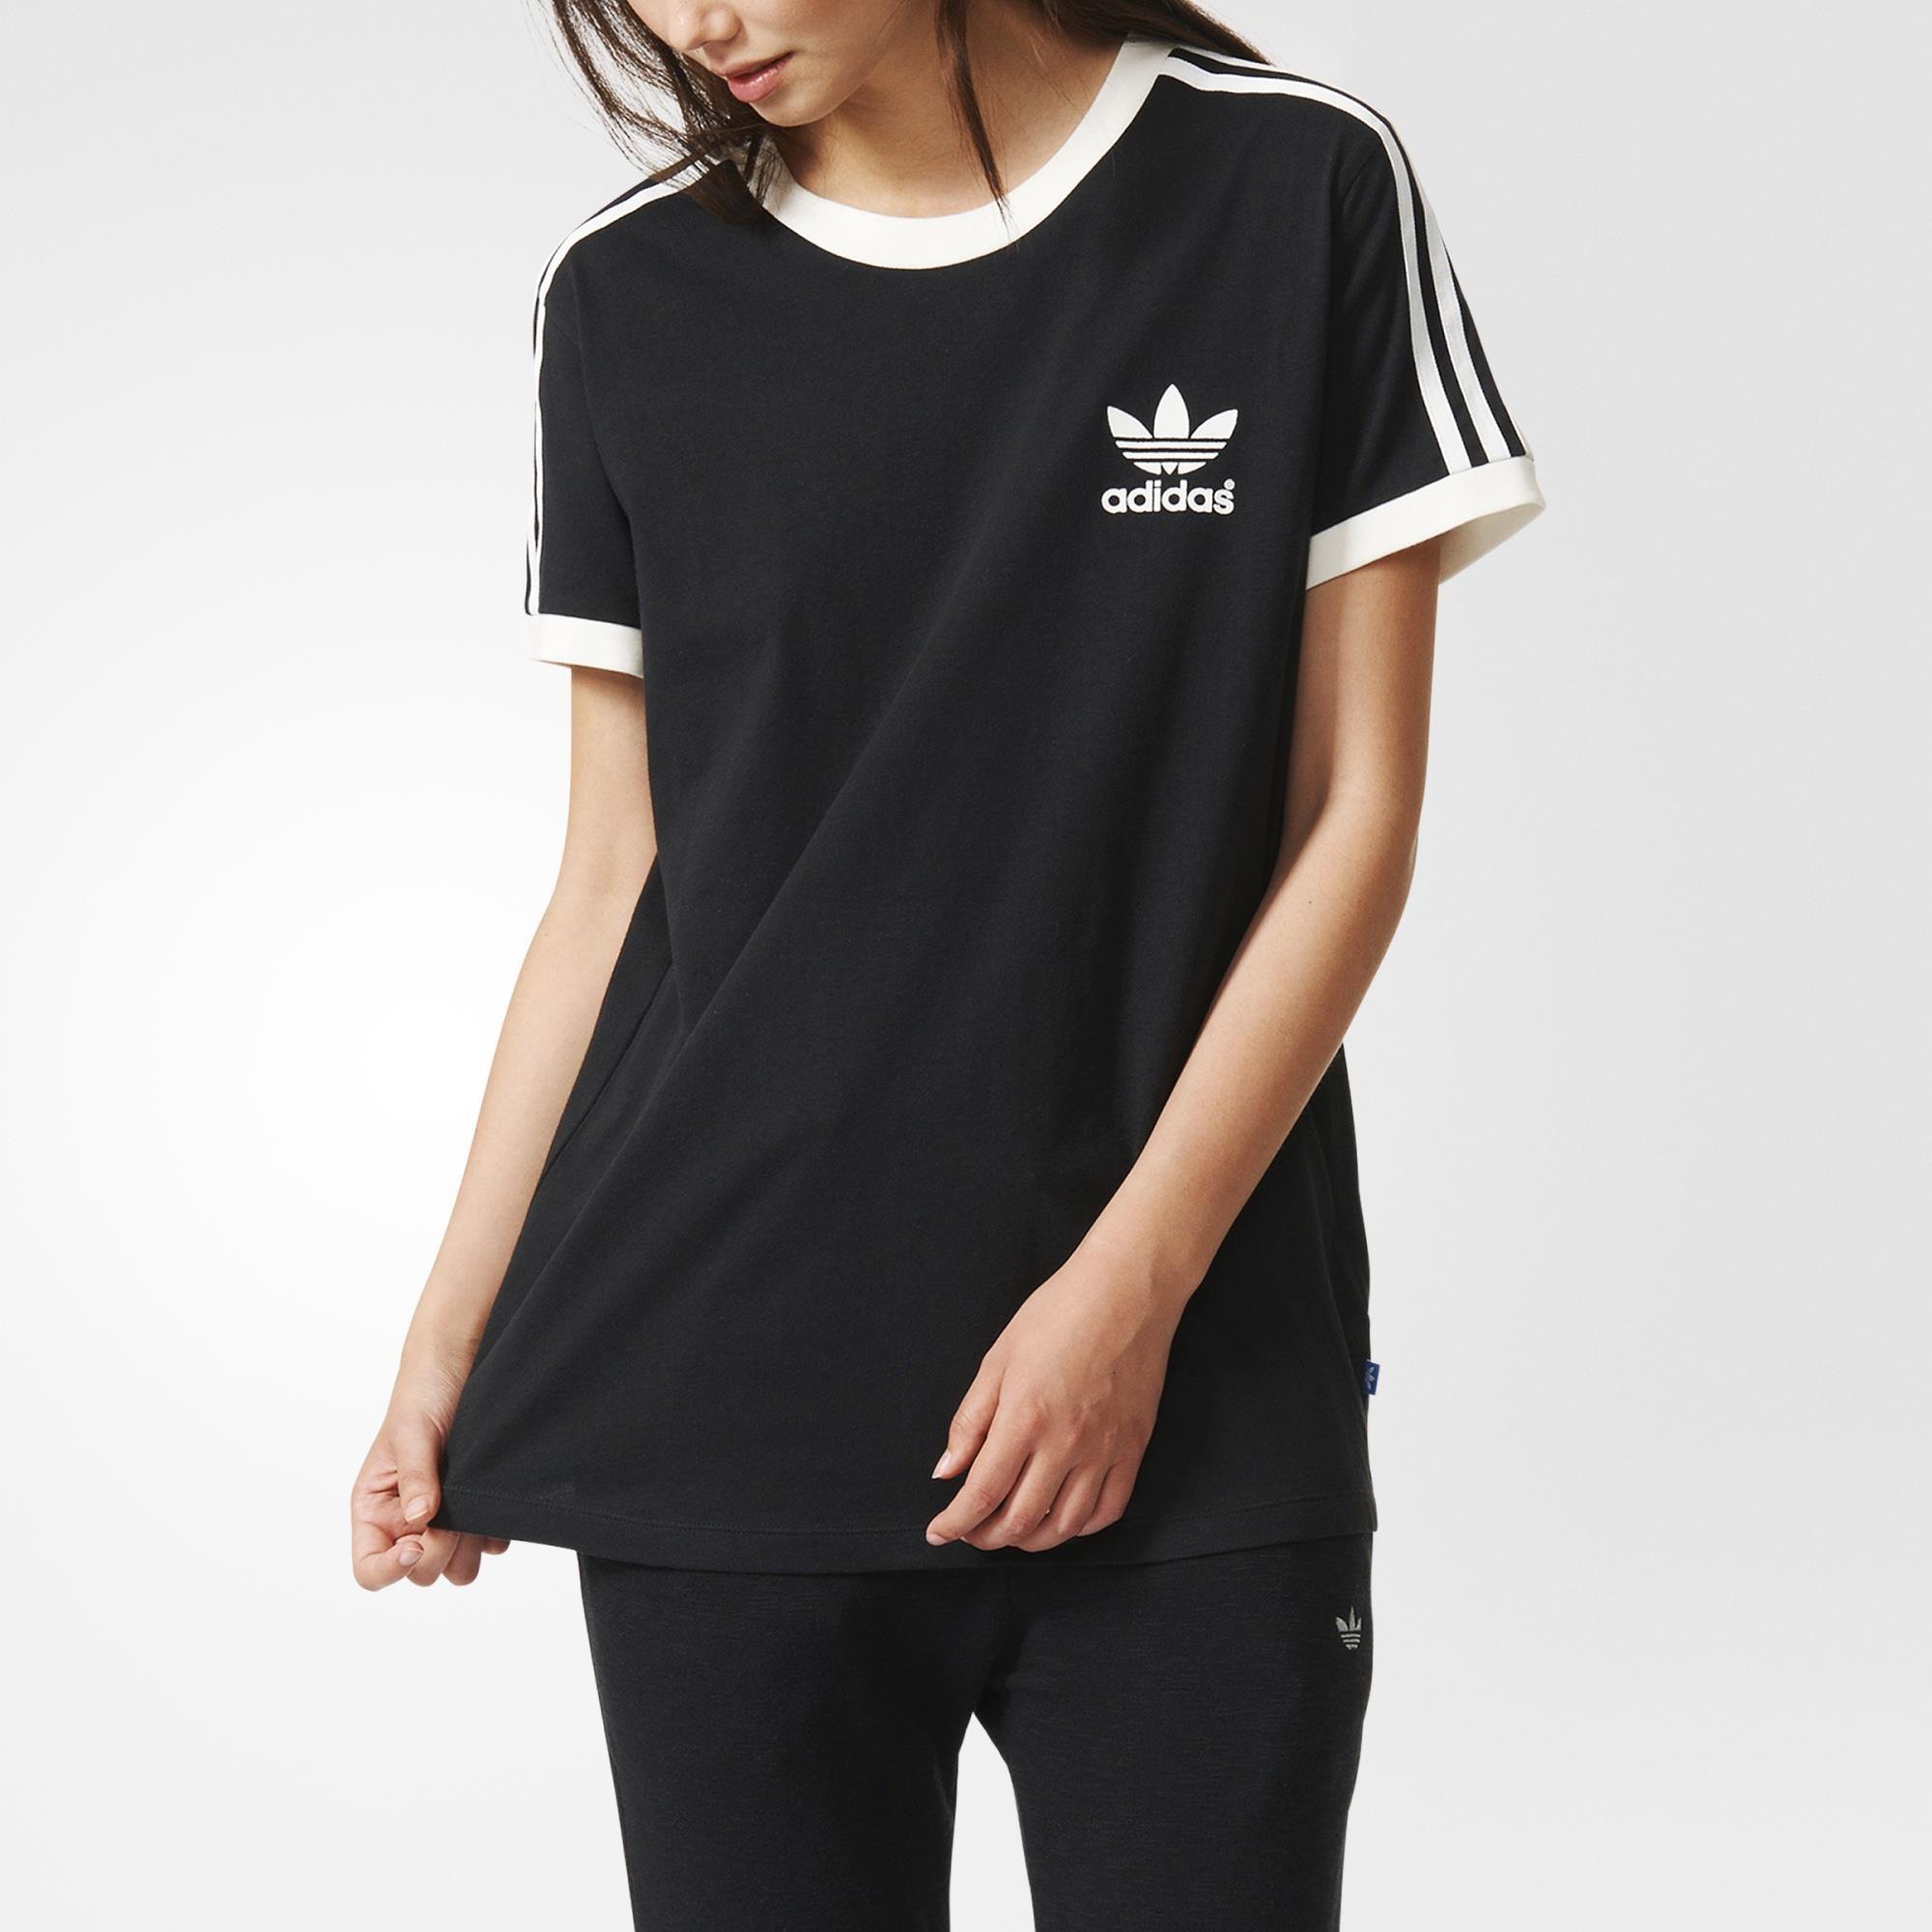 Black and white striped t shirt xxl - Adidas T Shirt Black White Adidas 3 Stripes Tee Black Adidas Uk